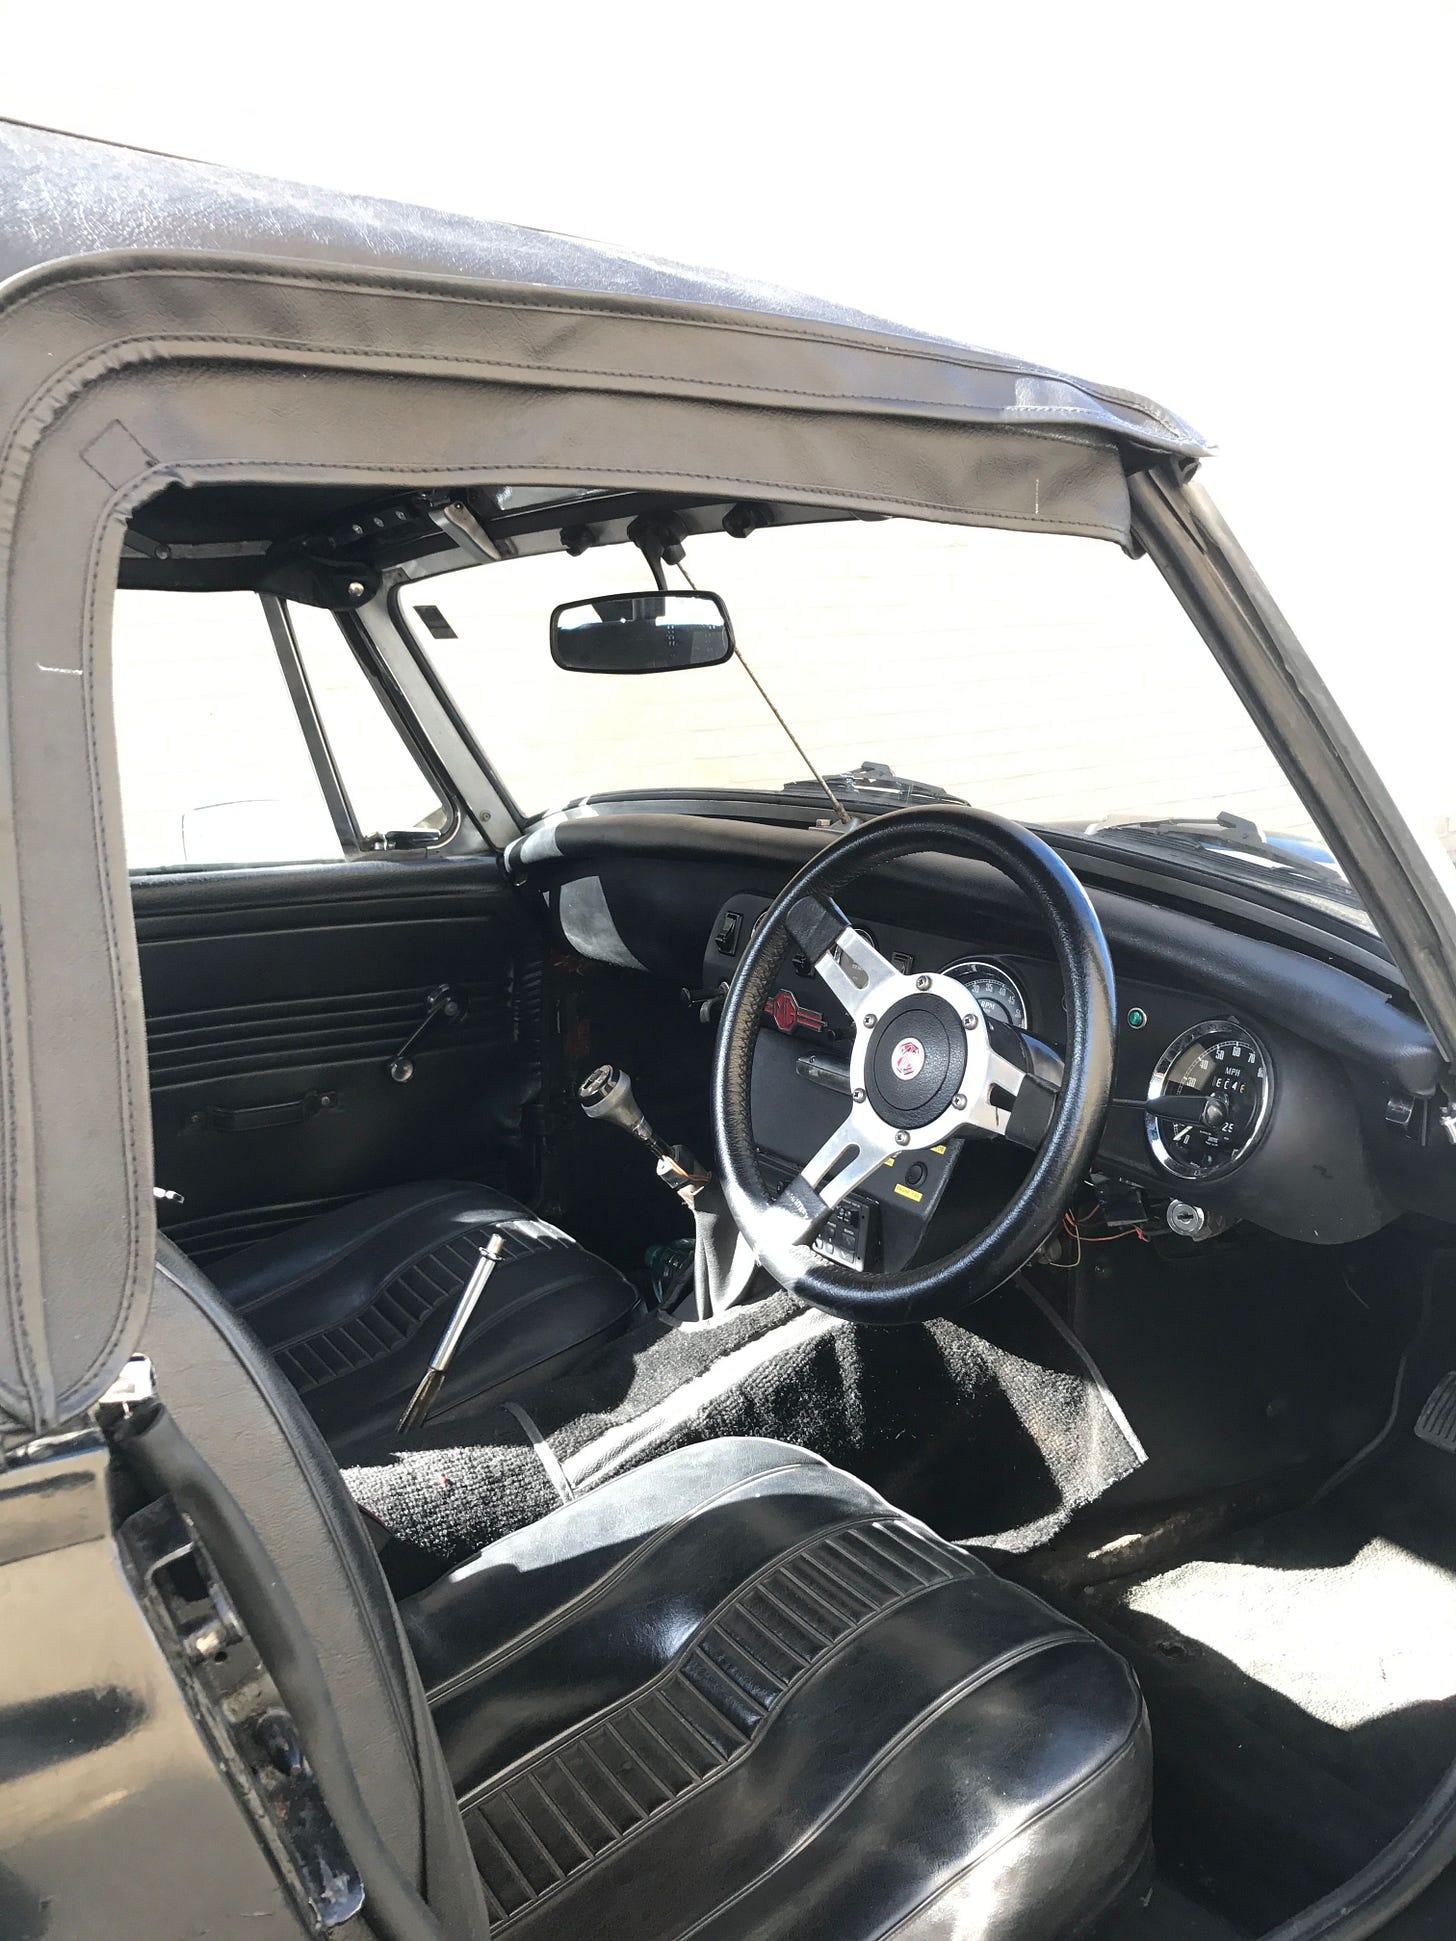 MG Midget interior - driver's side